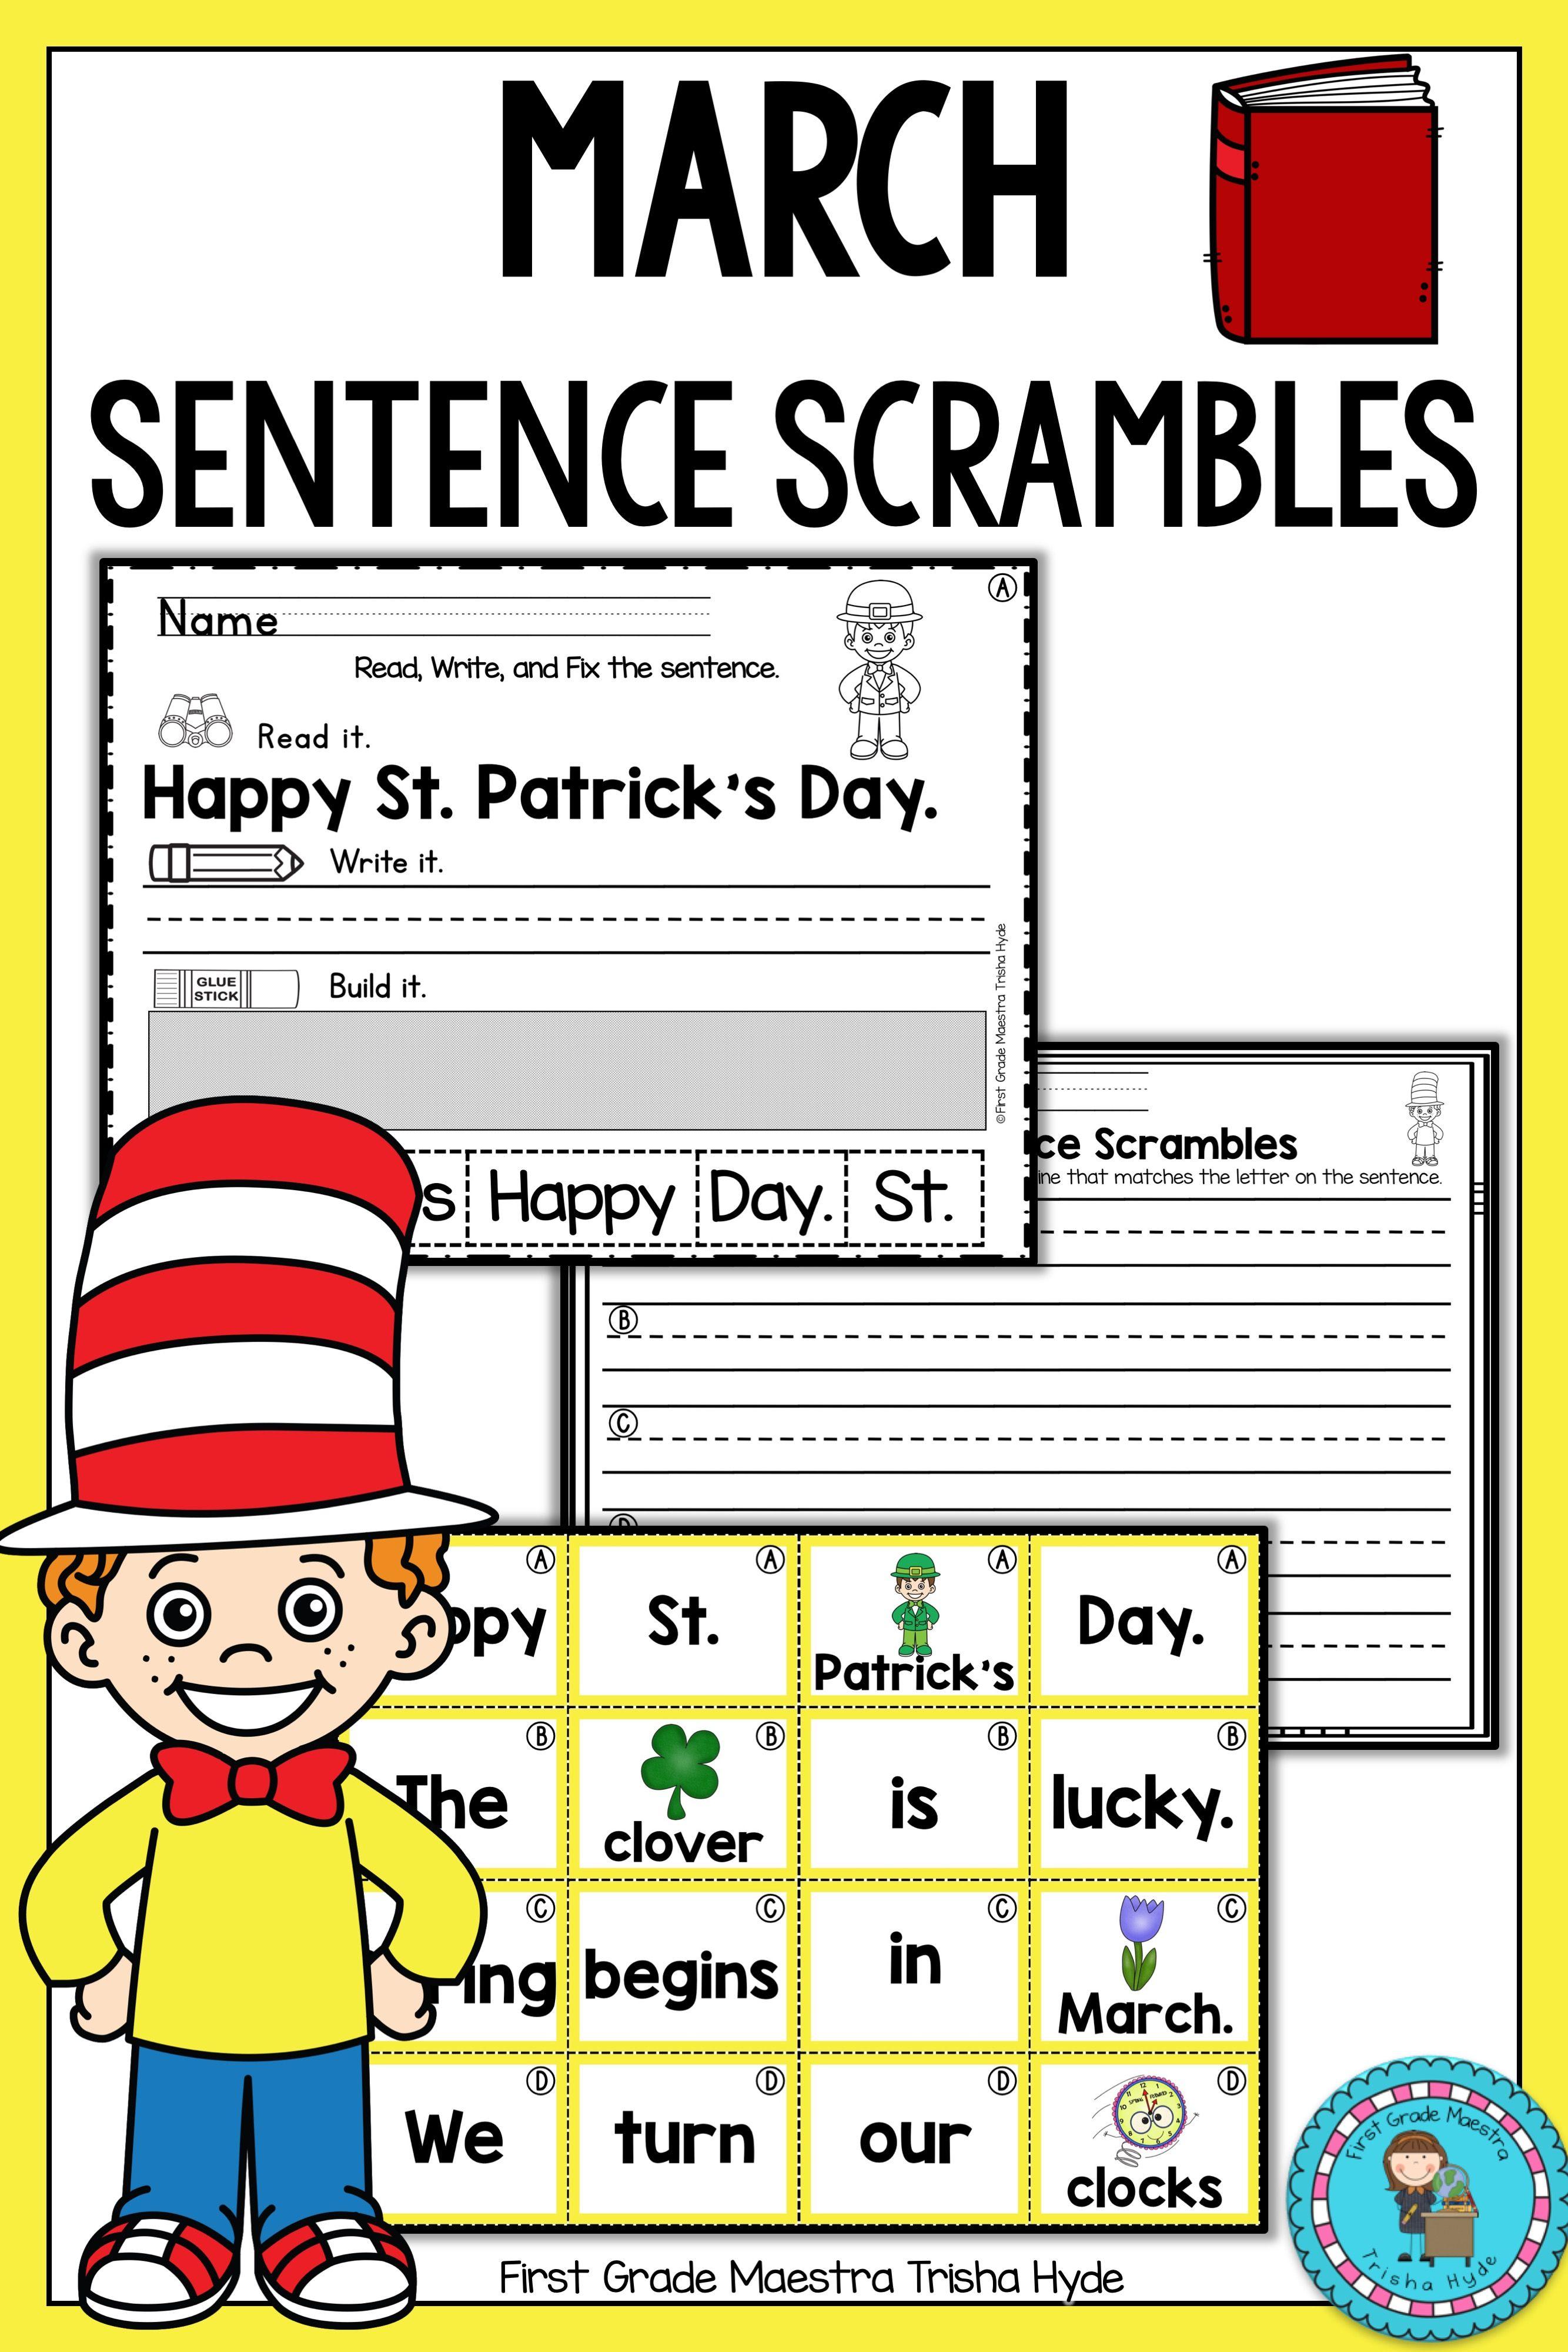 March Sentence Scrambles